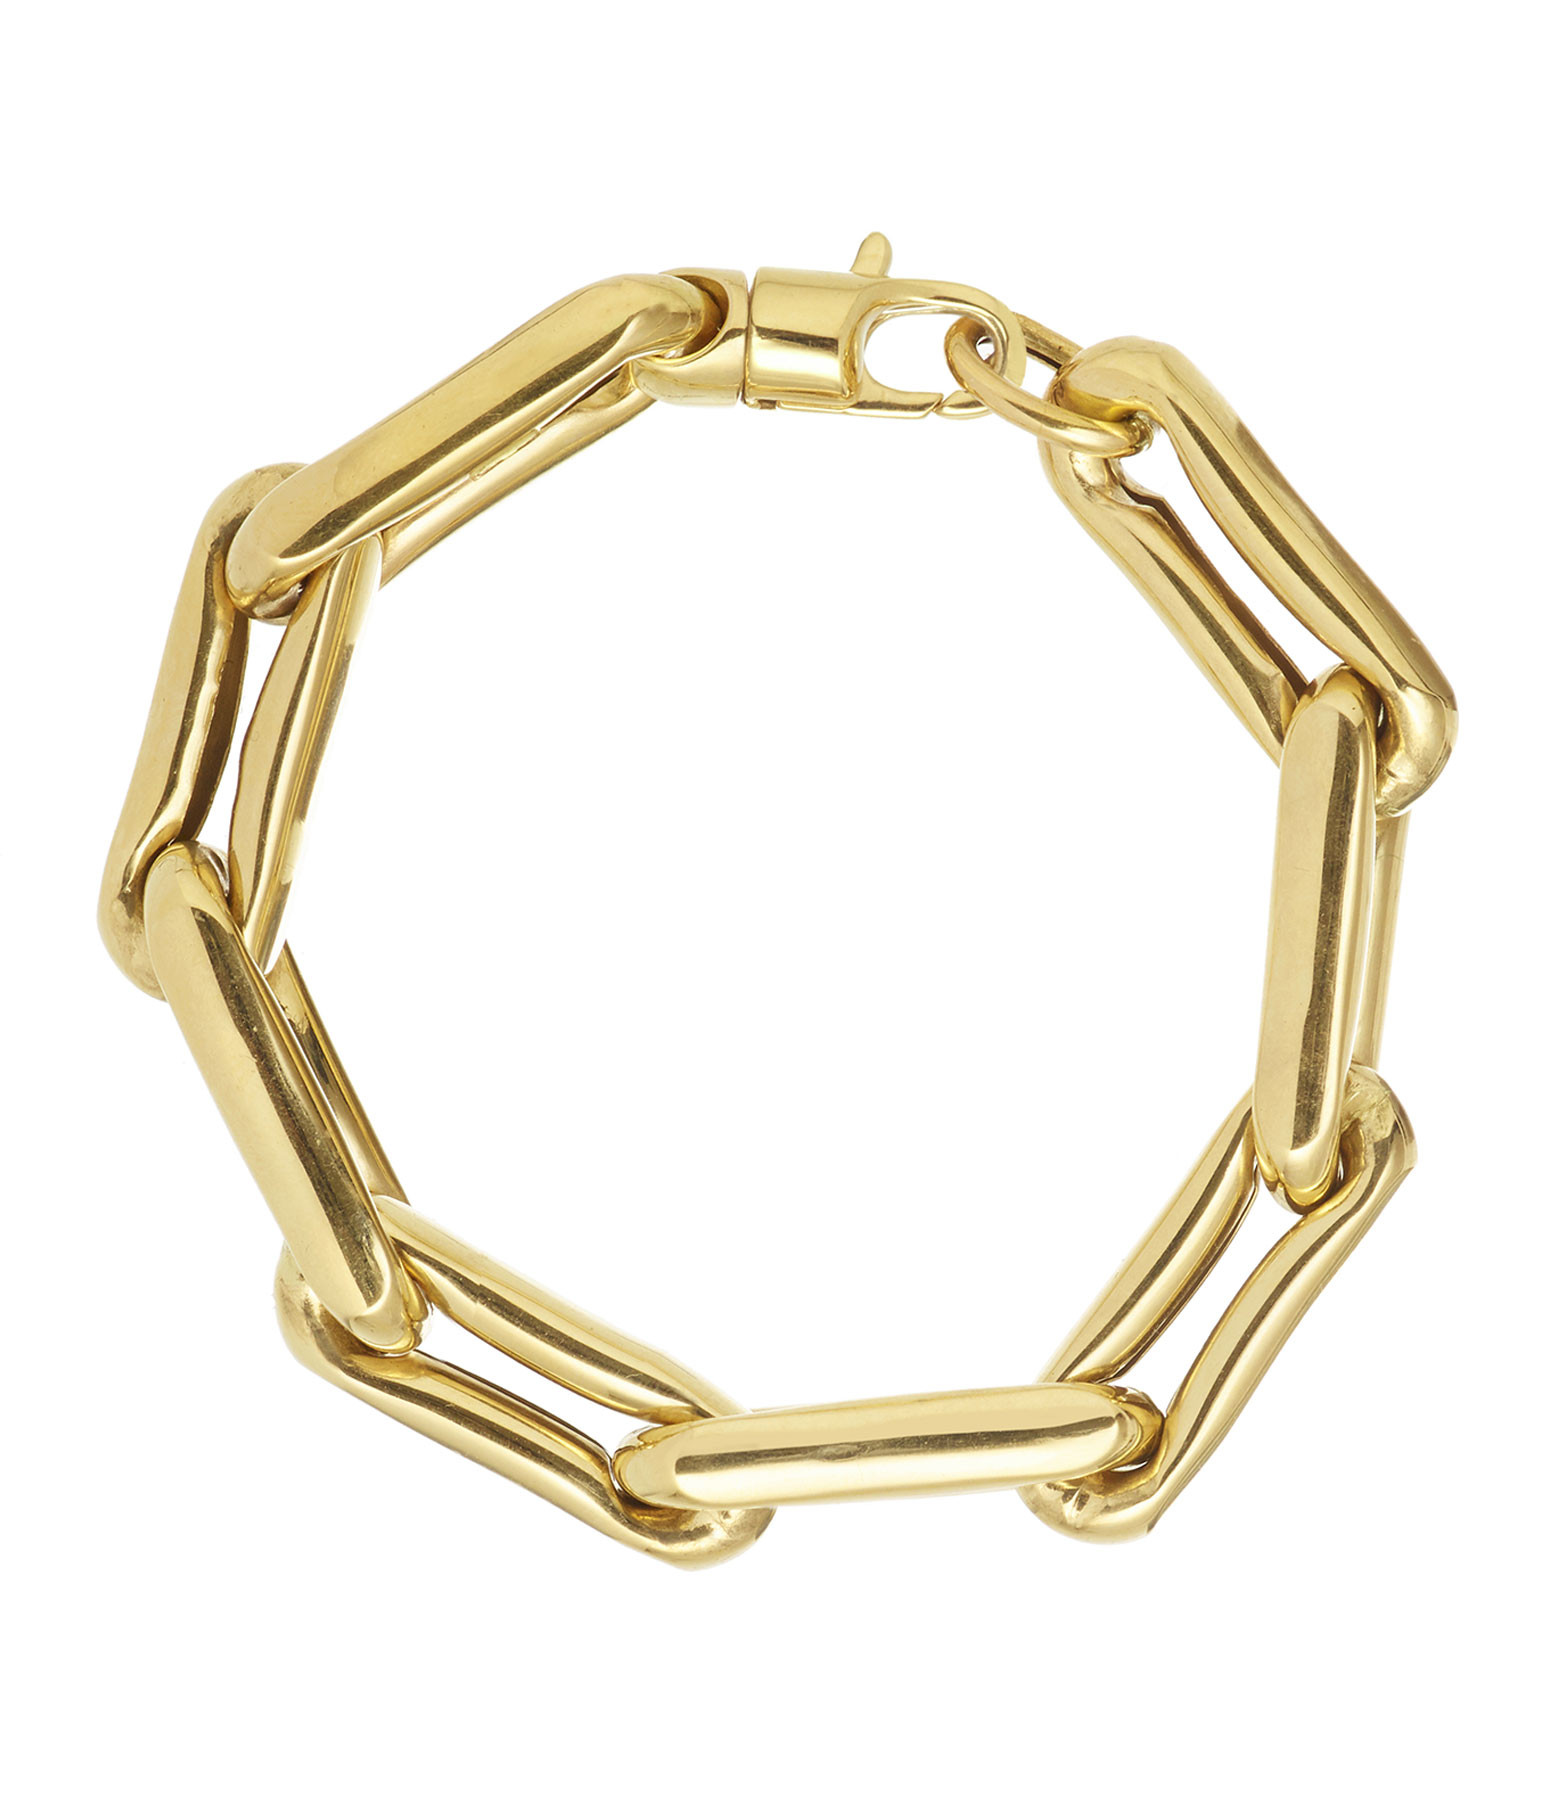 LAUREN RUBINSKI - Bracelet Extra Large 14 carats Or Jaune